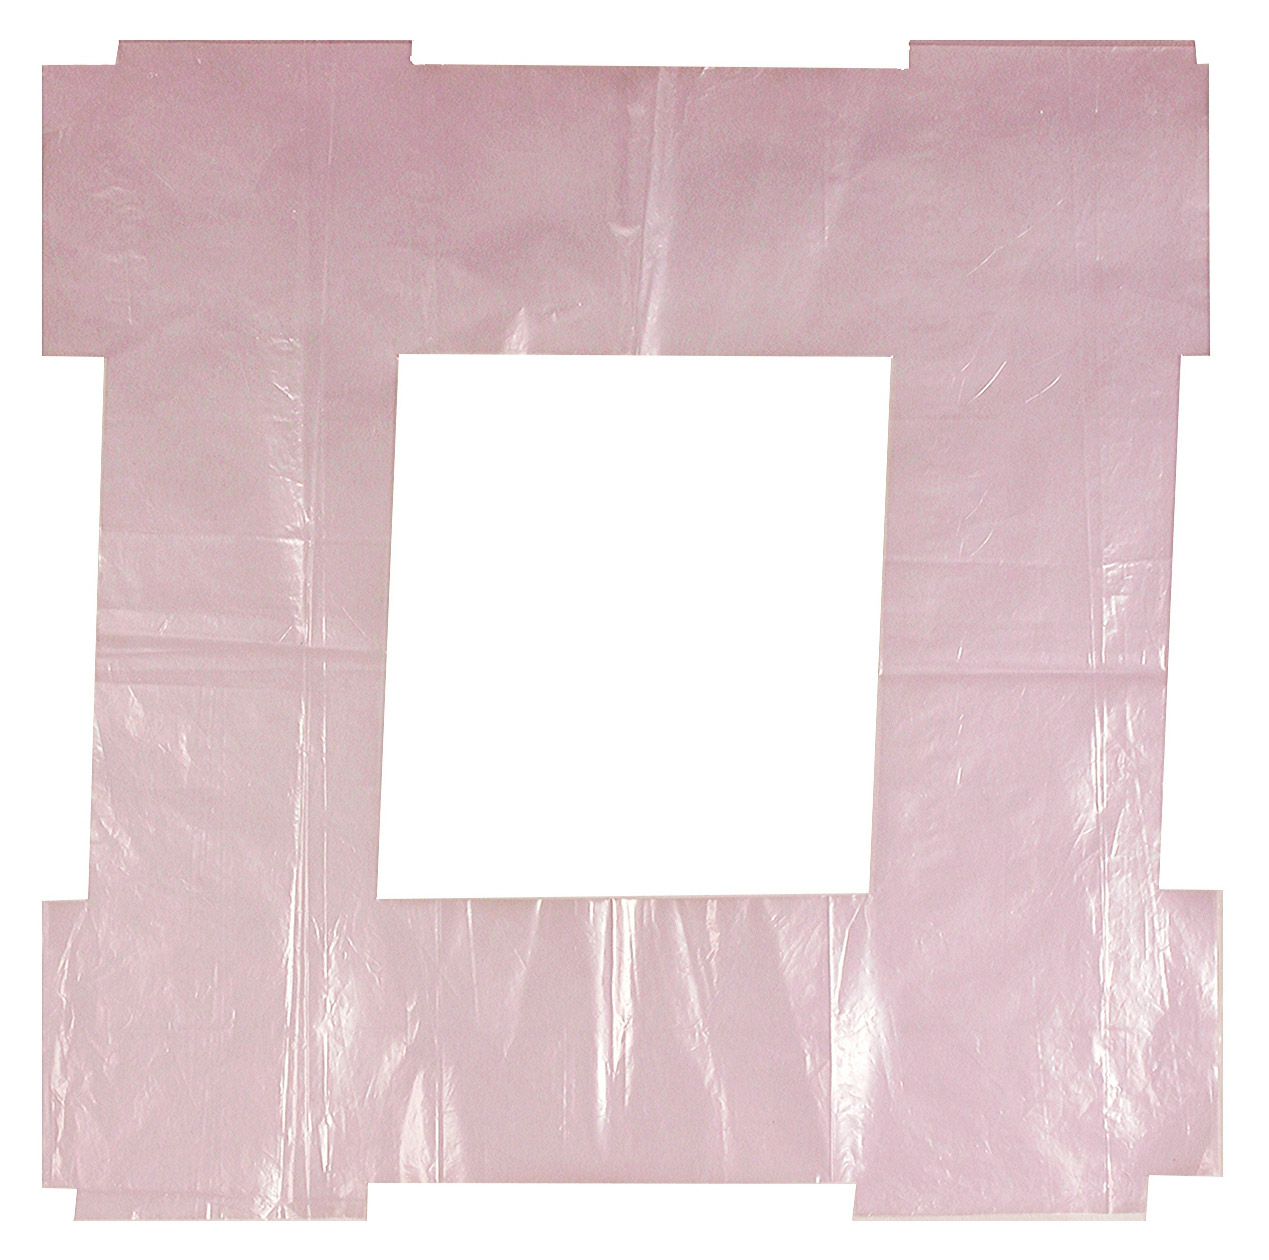 Untitled, 1998, shaped and folded rose-violet polyethylene film, 57 x 57 cm